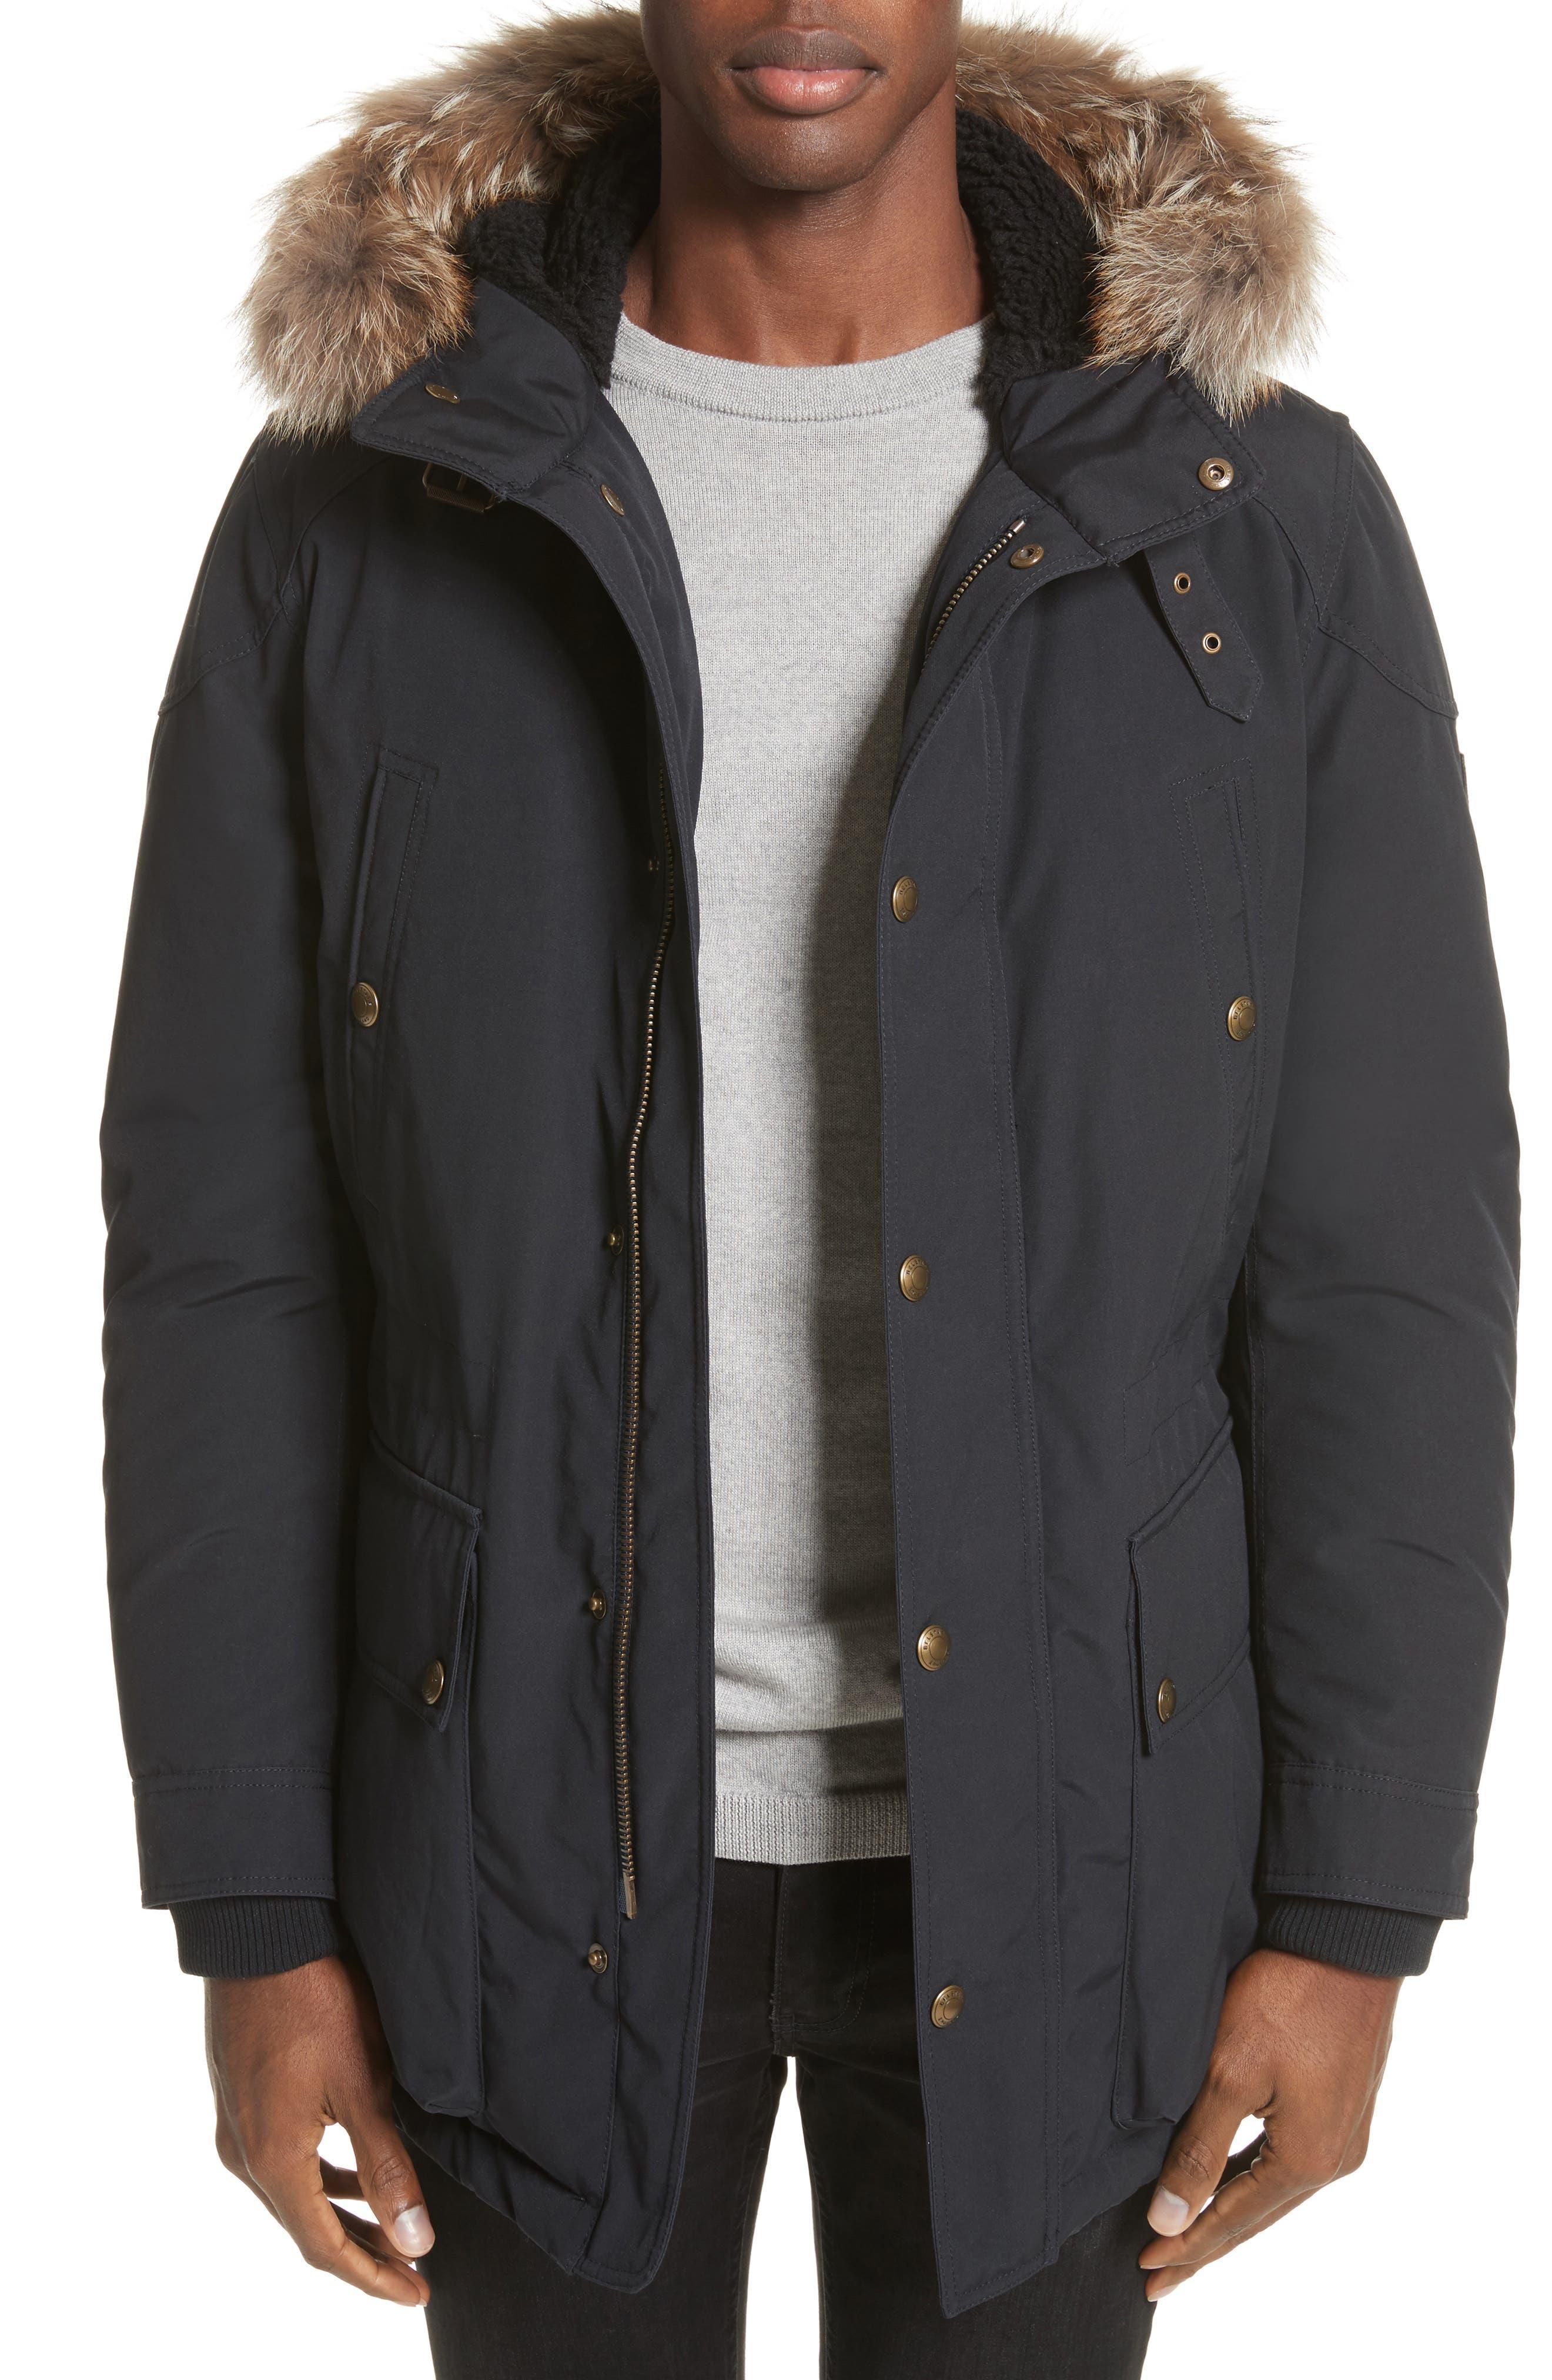 d7a4c5c8abc3 get canada goose coats uk costco offers this week 56e96 4689f